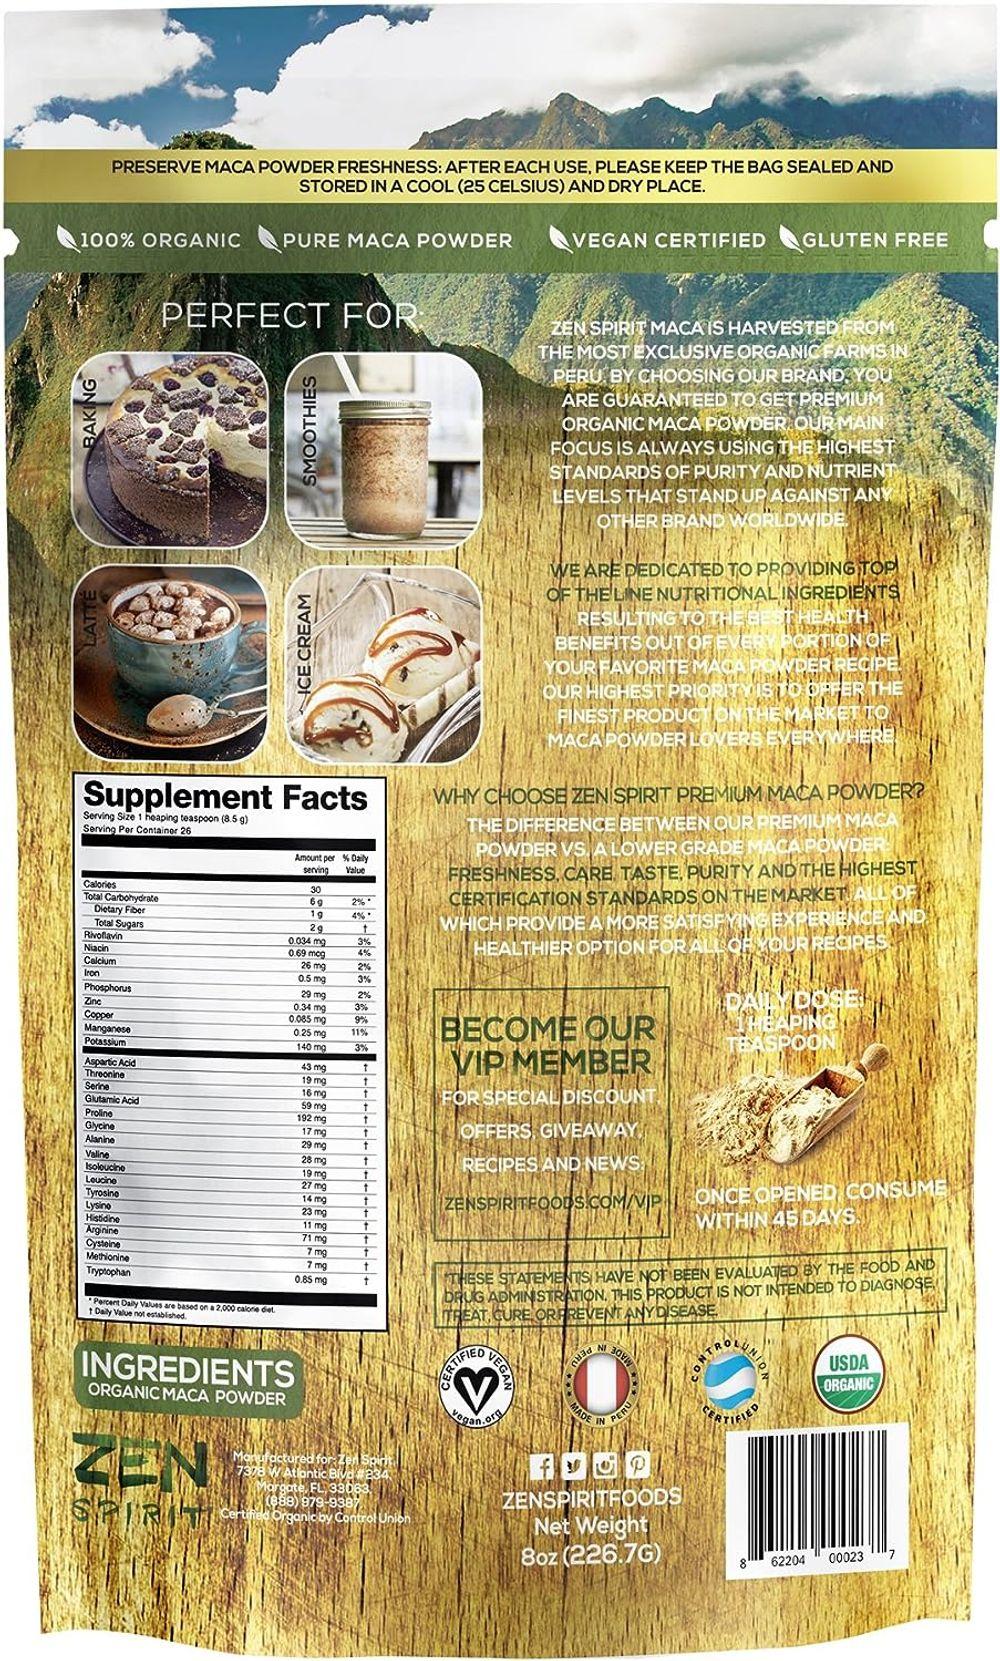 Maca Root Powder Organic - Peruvian Root Premium Grade Superfood (Raw) - USDA & Vegan Certified - 226.7g (8oz) - Perfect for Breakfast, Smoothies, Baking & Ice Cream.